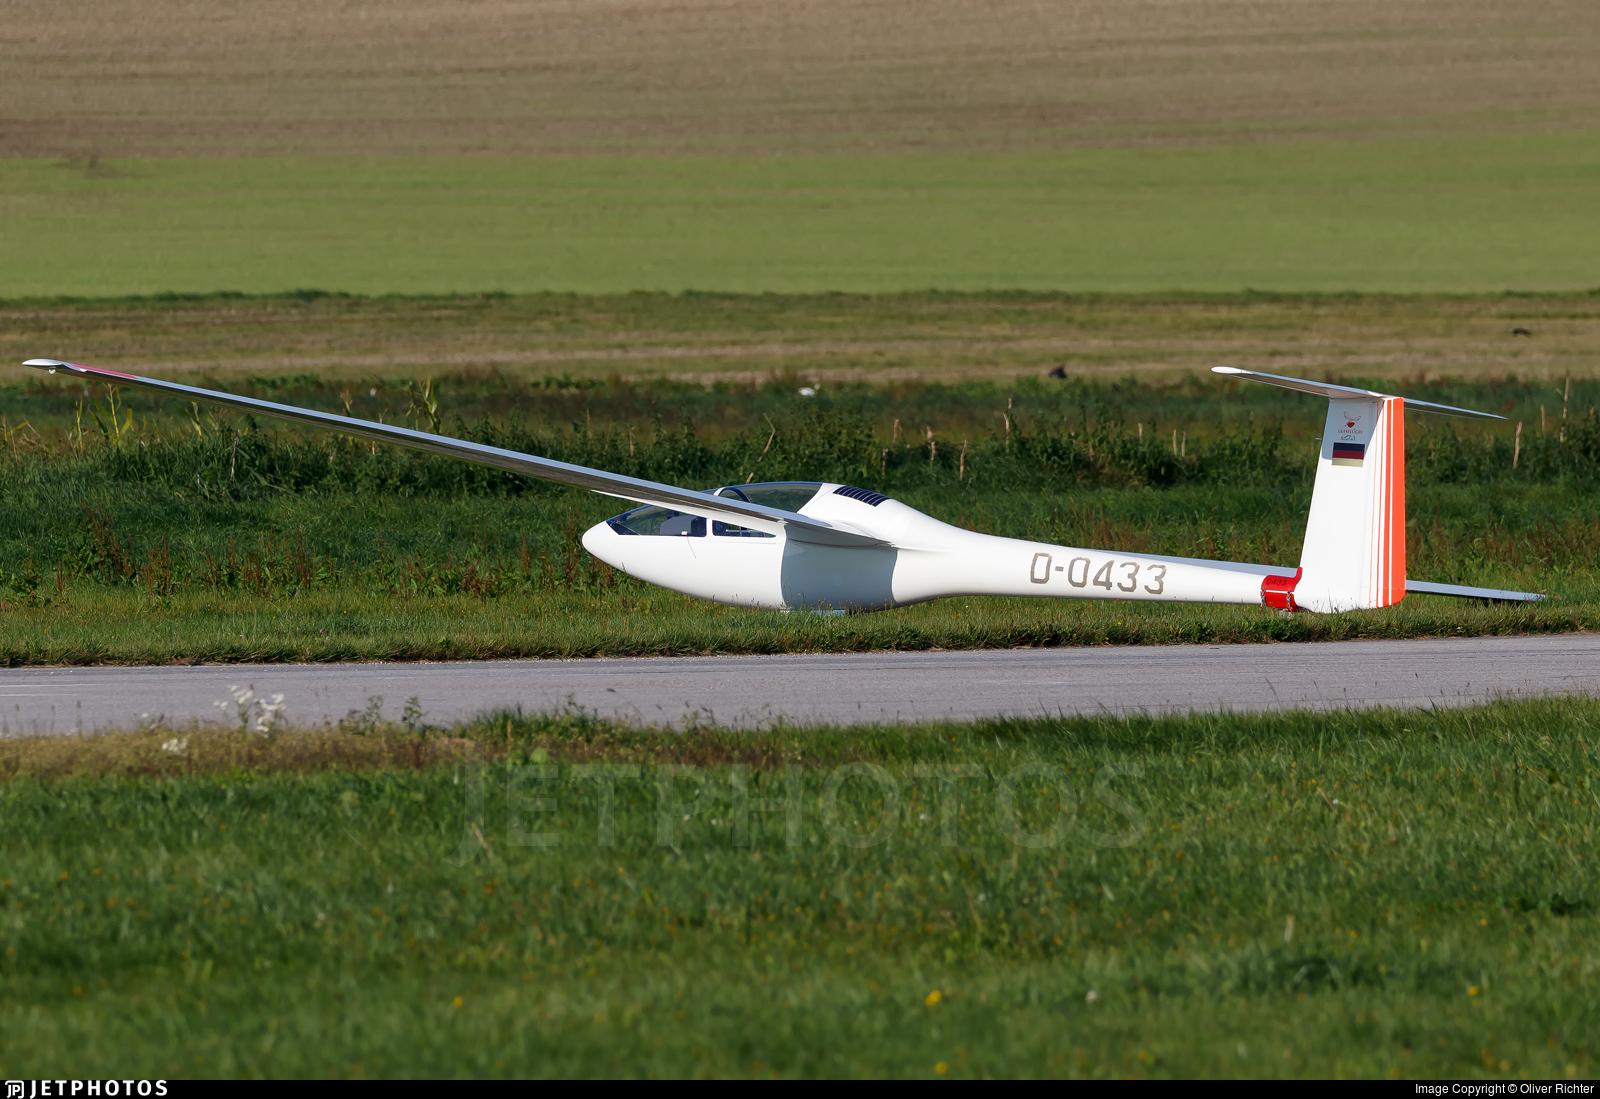 D-0433 - Glasflugel H401 Kestrel - Private